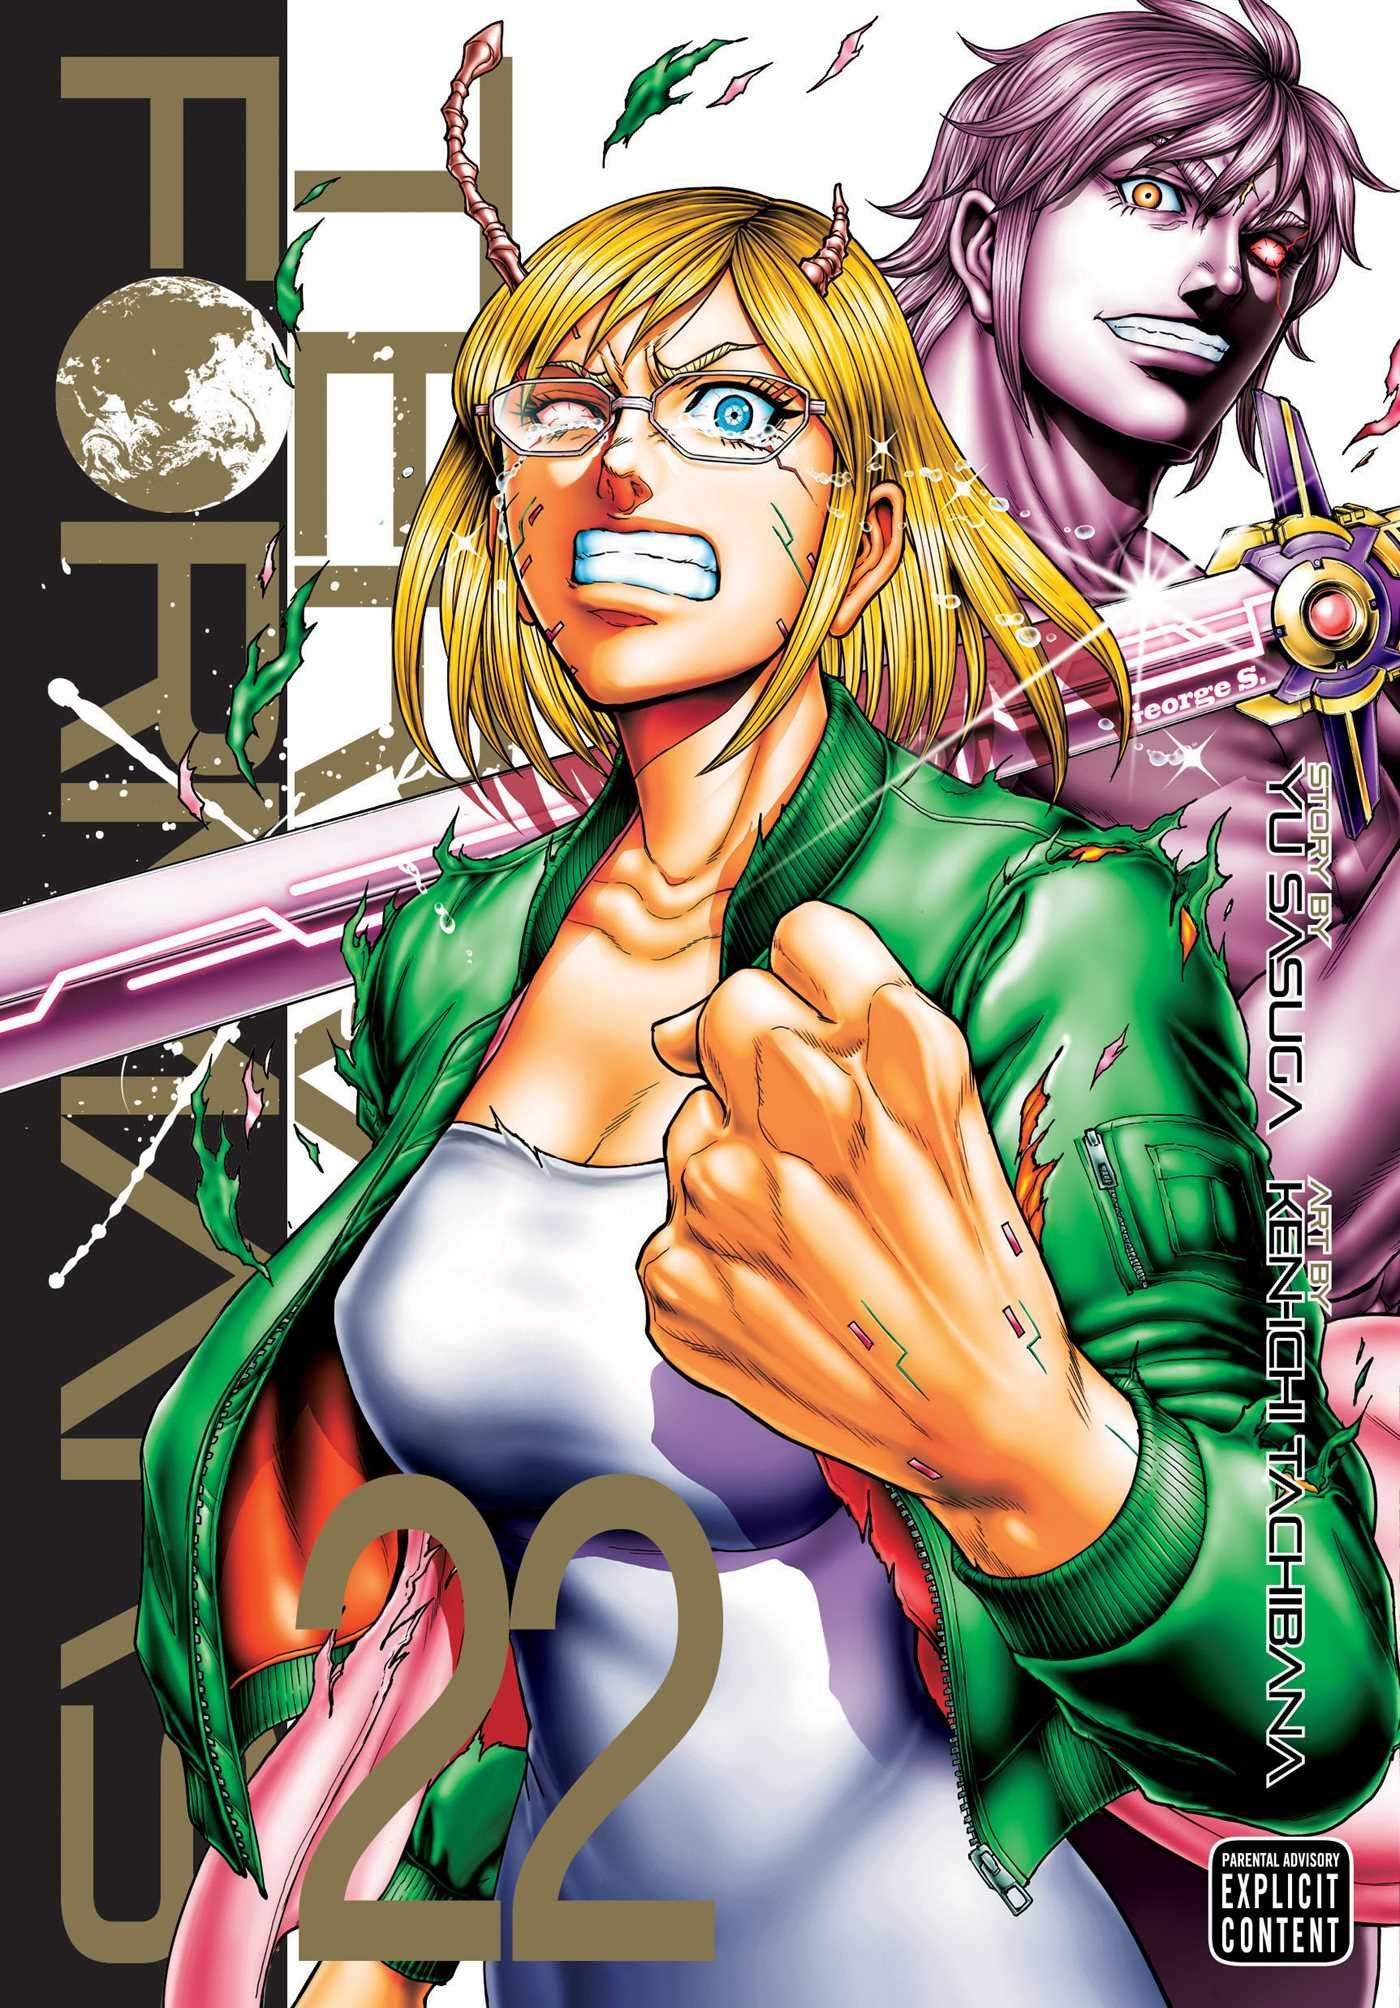 Terra Formars 22 Volume 22 Amazon Co Uk Sasuga Yu Kenichi Tachibana 9781974709557 Books